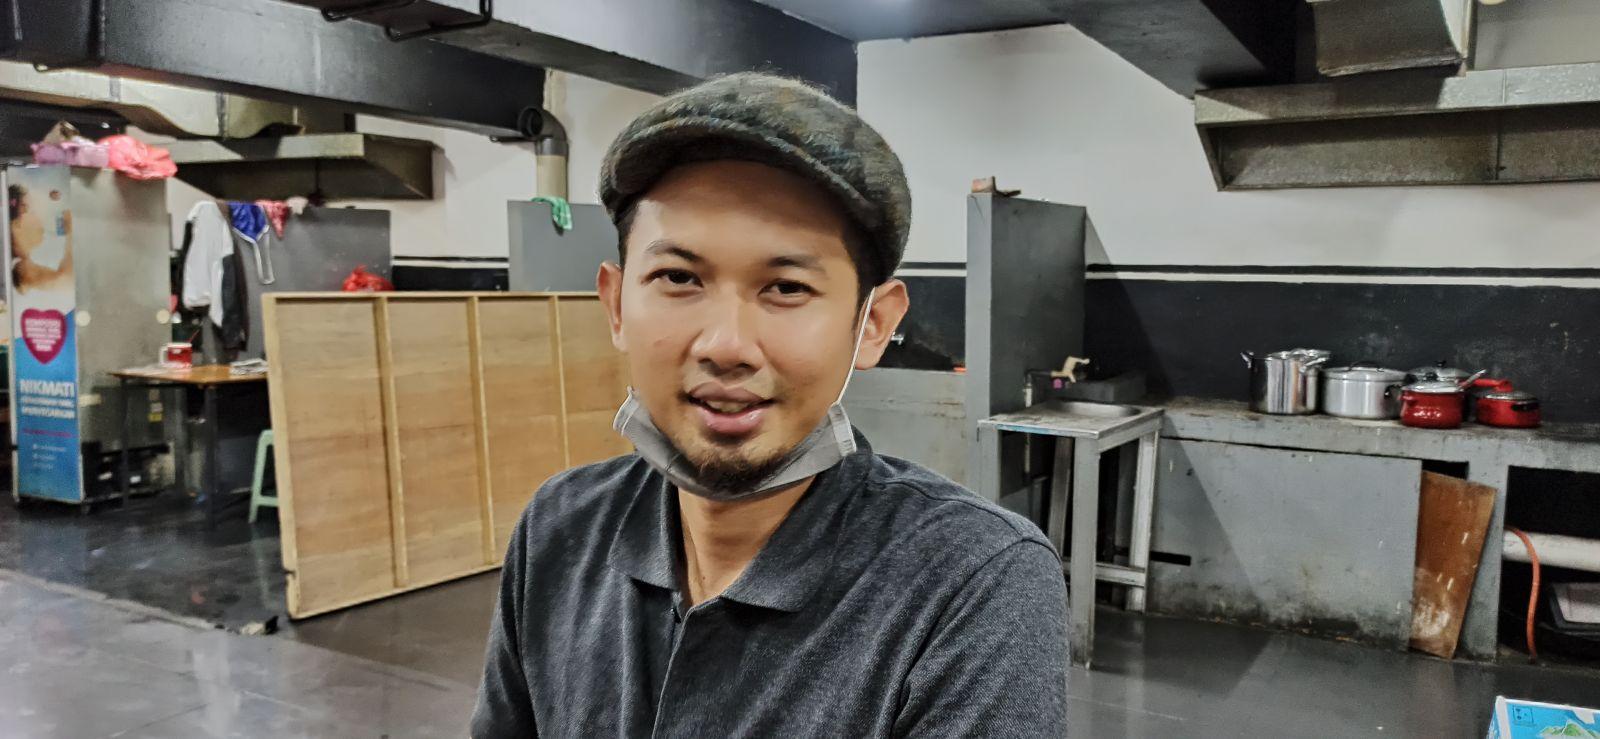 Pendiri PT. Hardi Karya Bahagia Eko Hardi Saputra. Foto: Andi Ristanto/GenPI.co